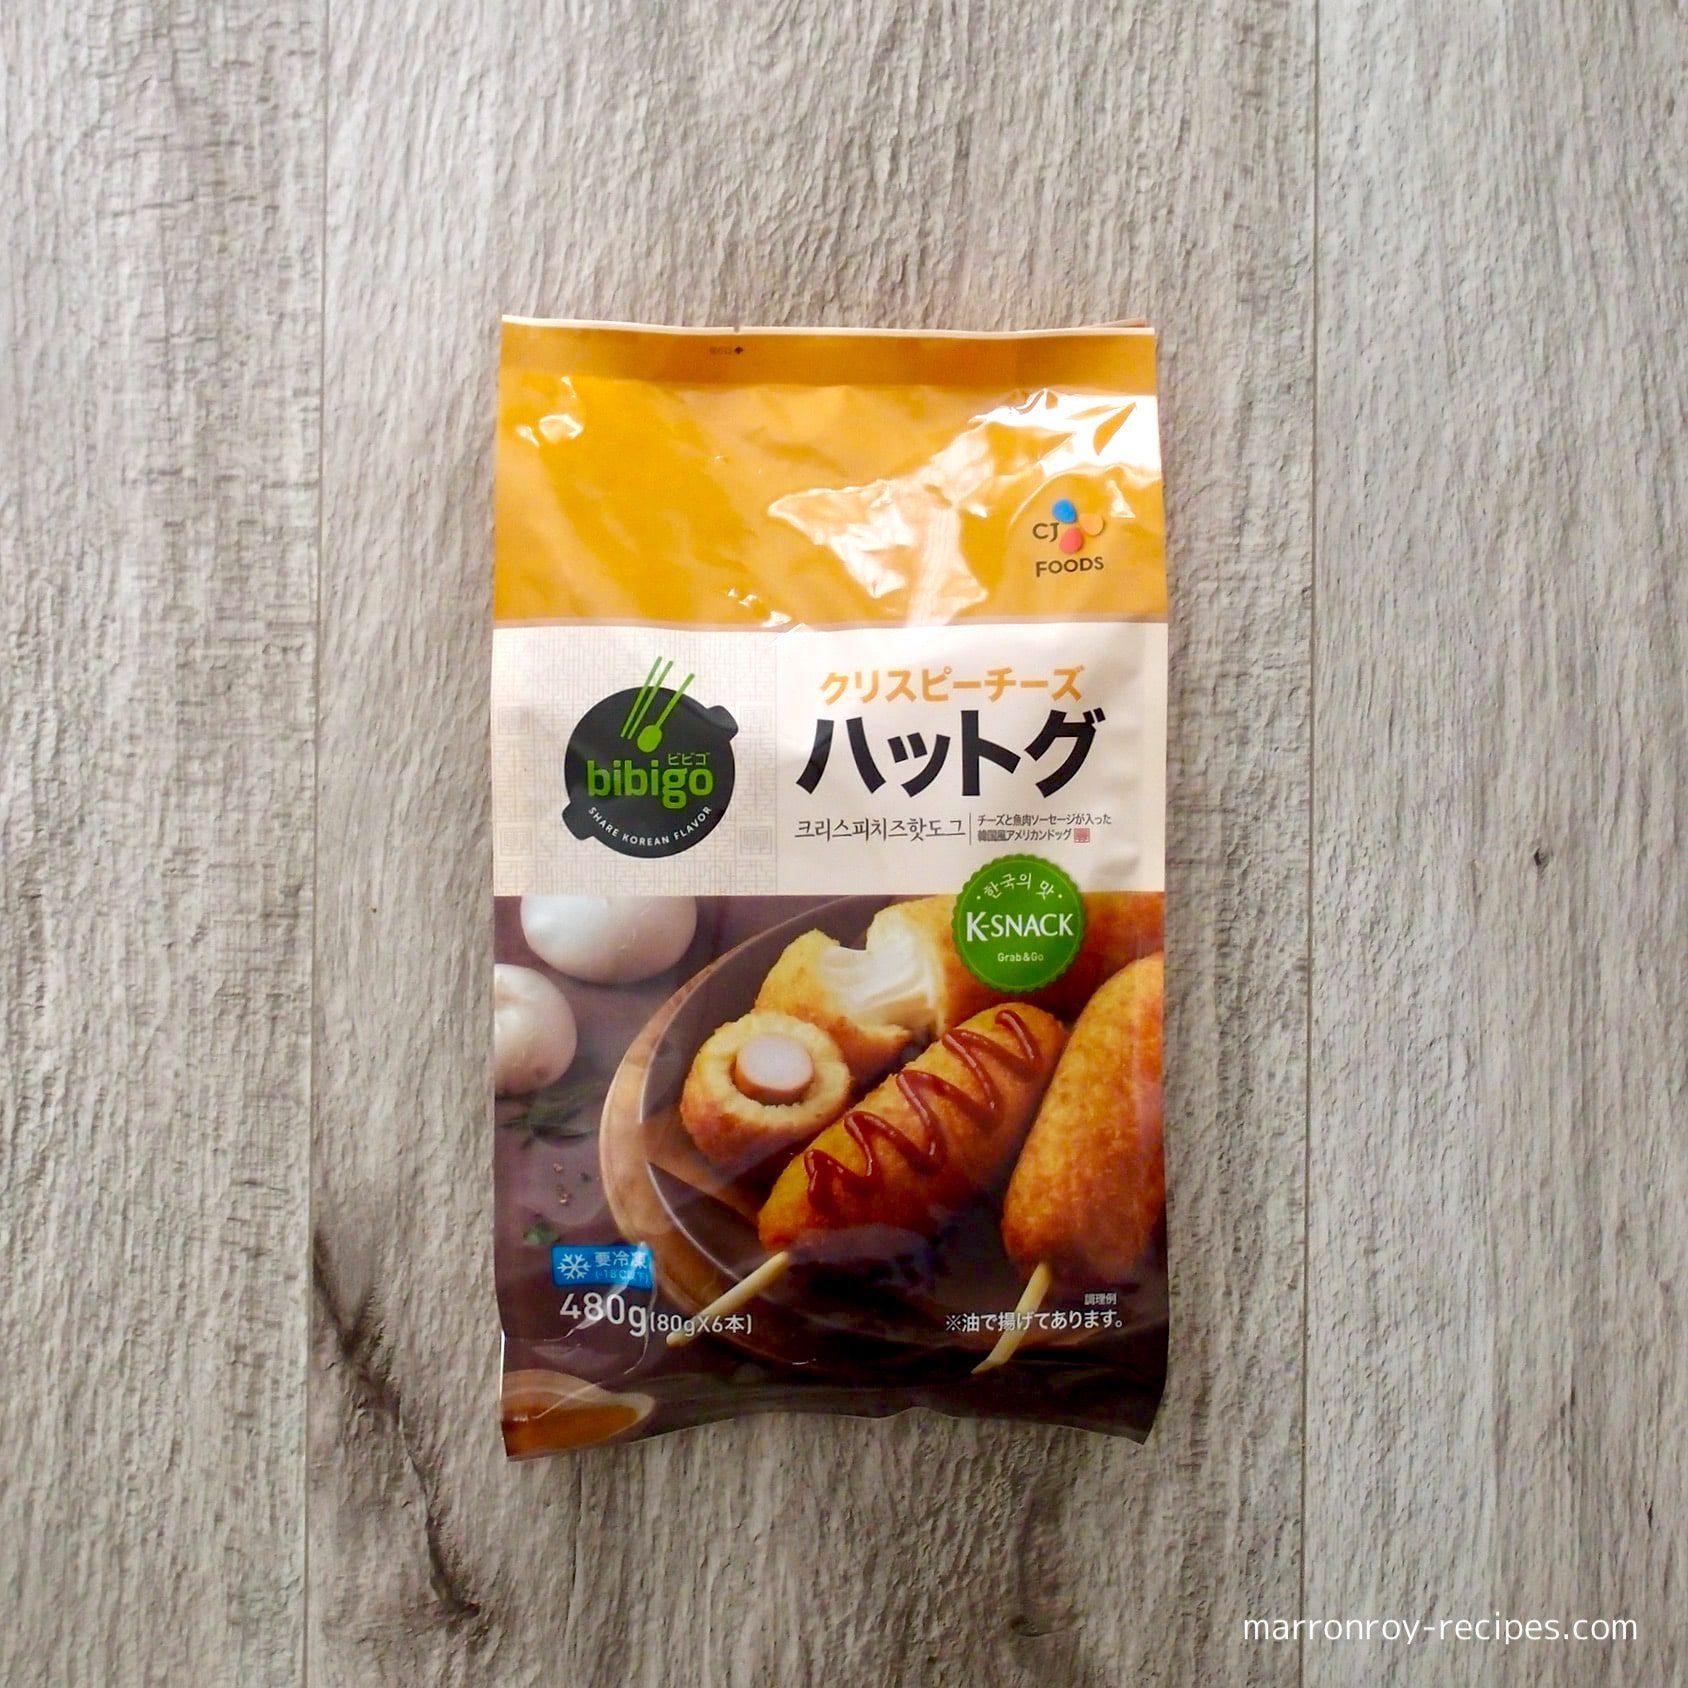 bibigo snack